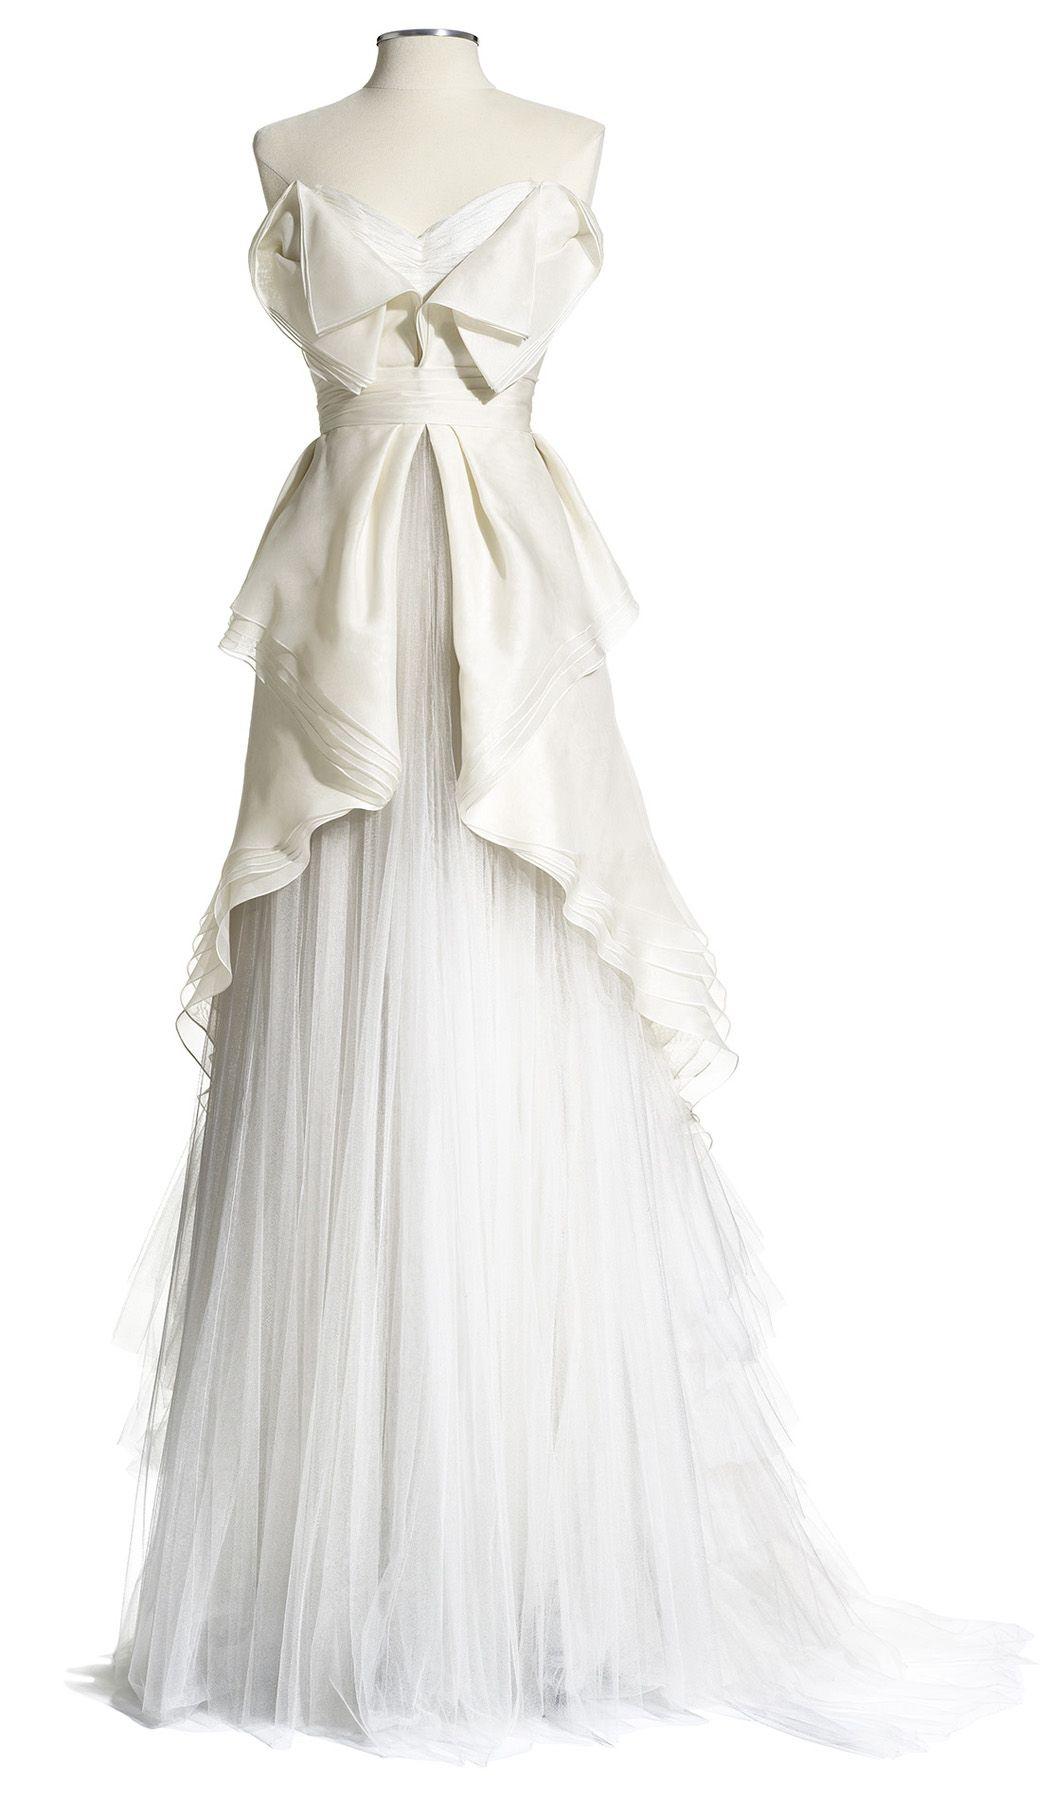 Jmendel bridal collection wedding bridal wedding gowns j